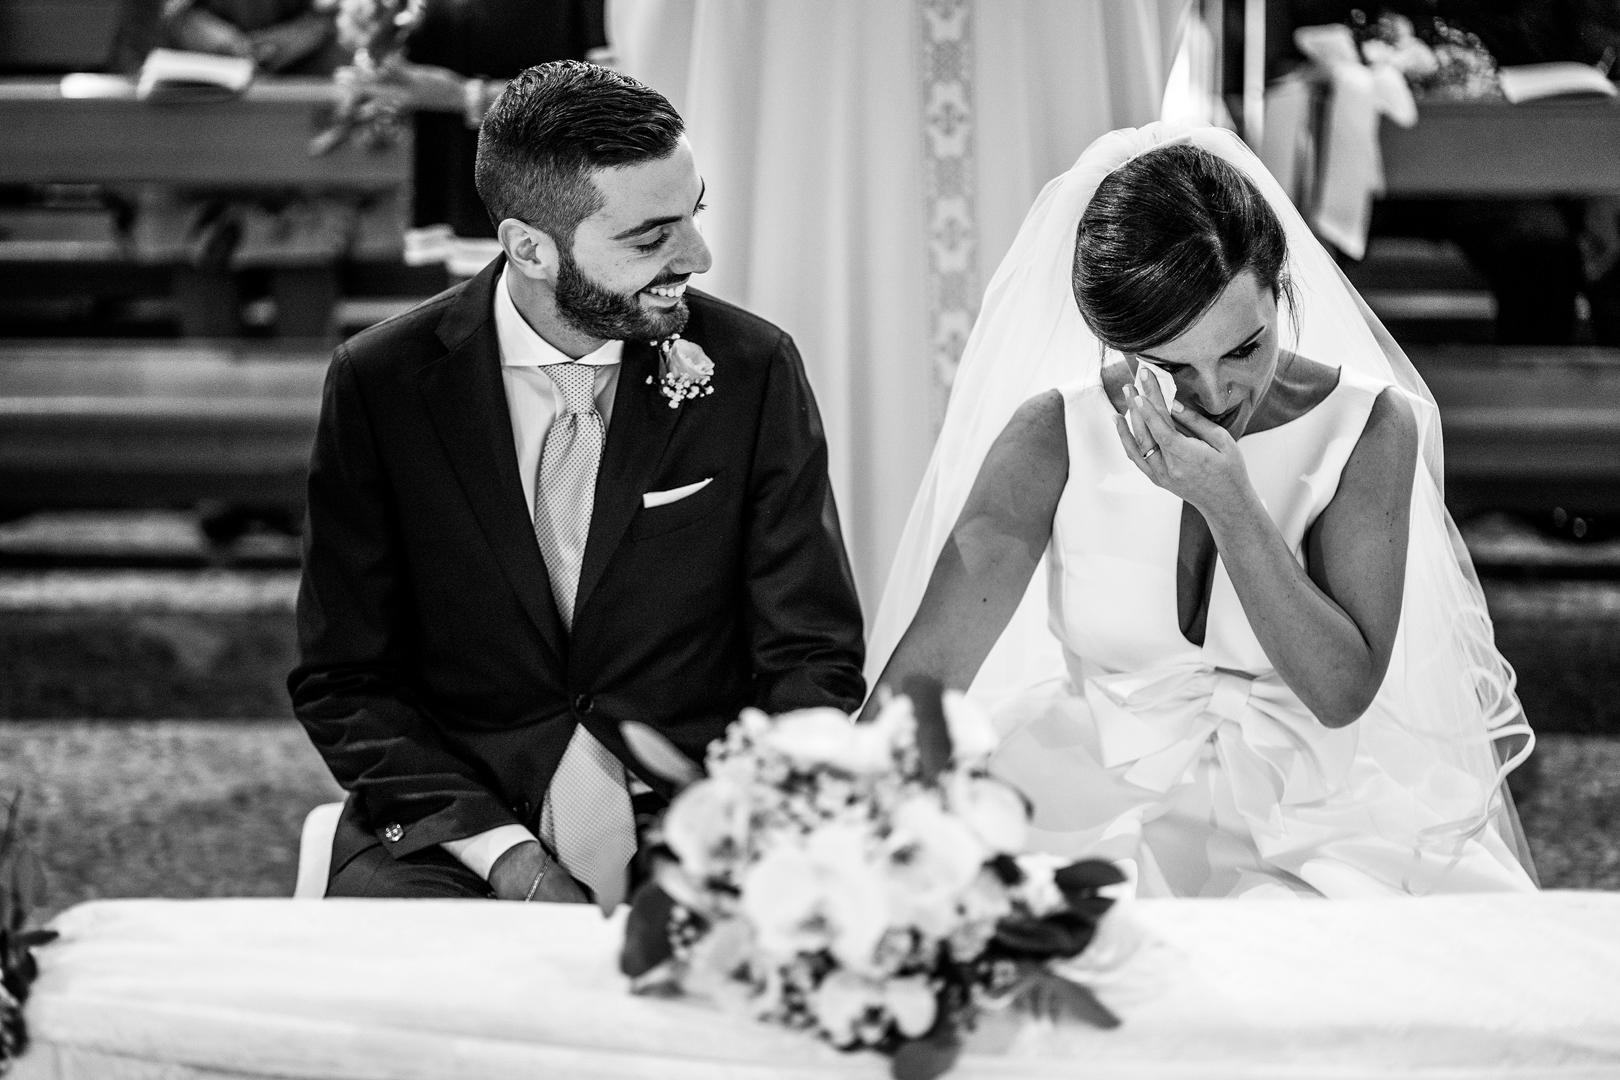 34 gianni-lepore-matrimonio-chiesa-emozione-sposa-piange